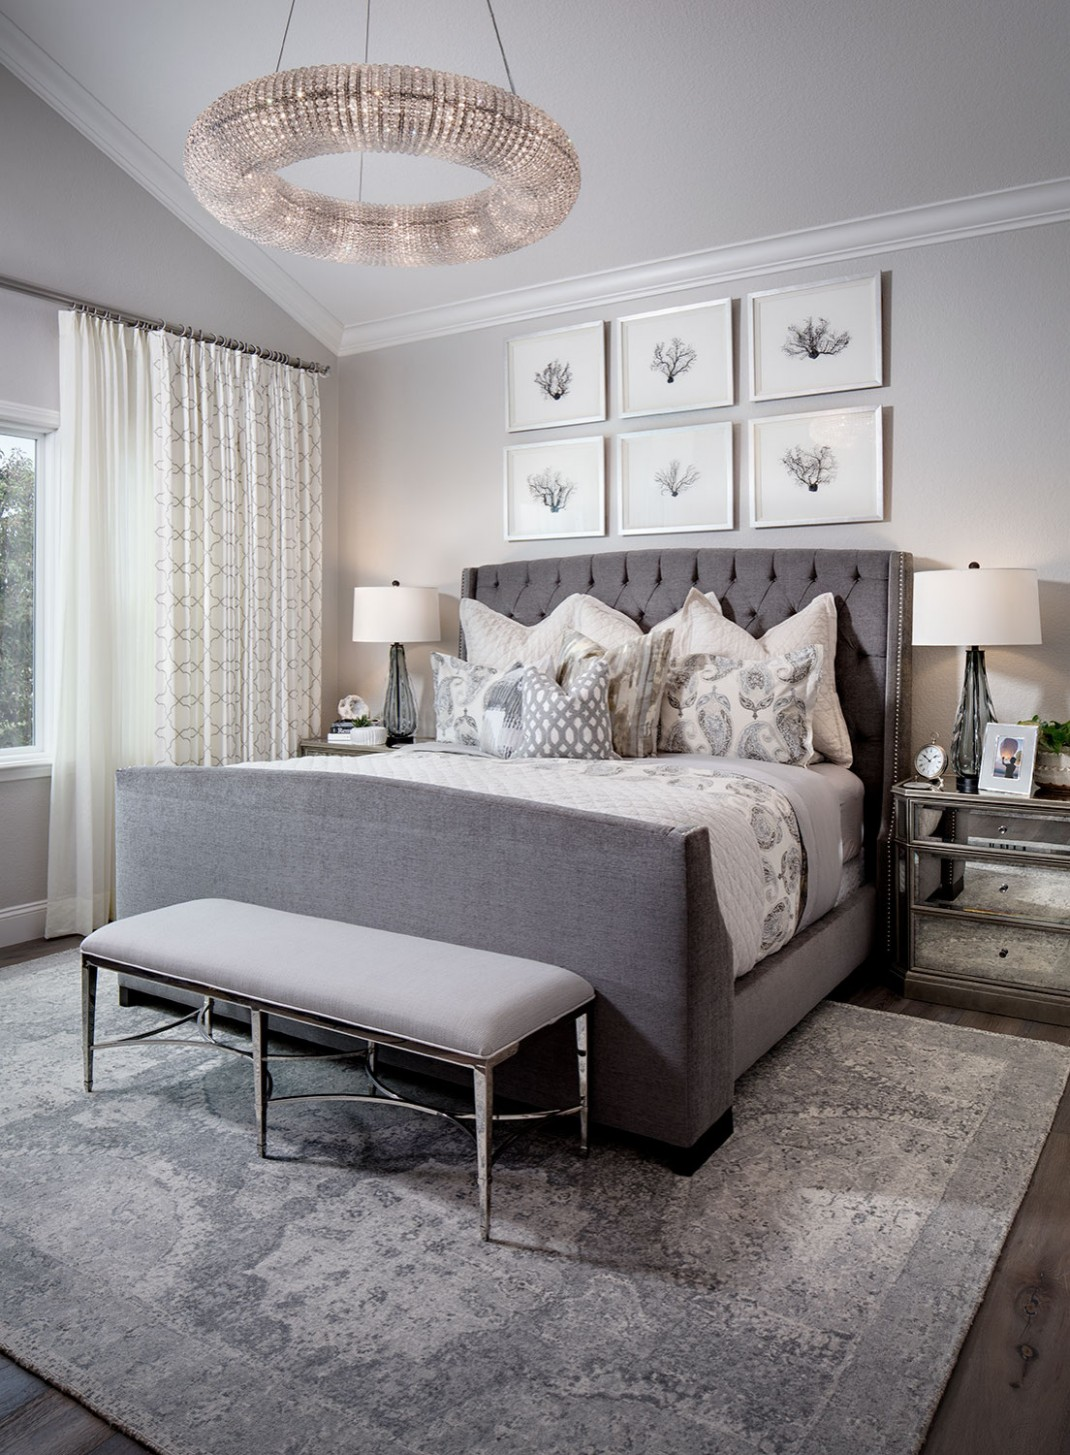 11 Beautiful Gray Bedroom Pictures & Ideas - November, 11  Houzz - Bedroom Ideas In Grey